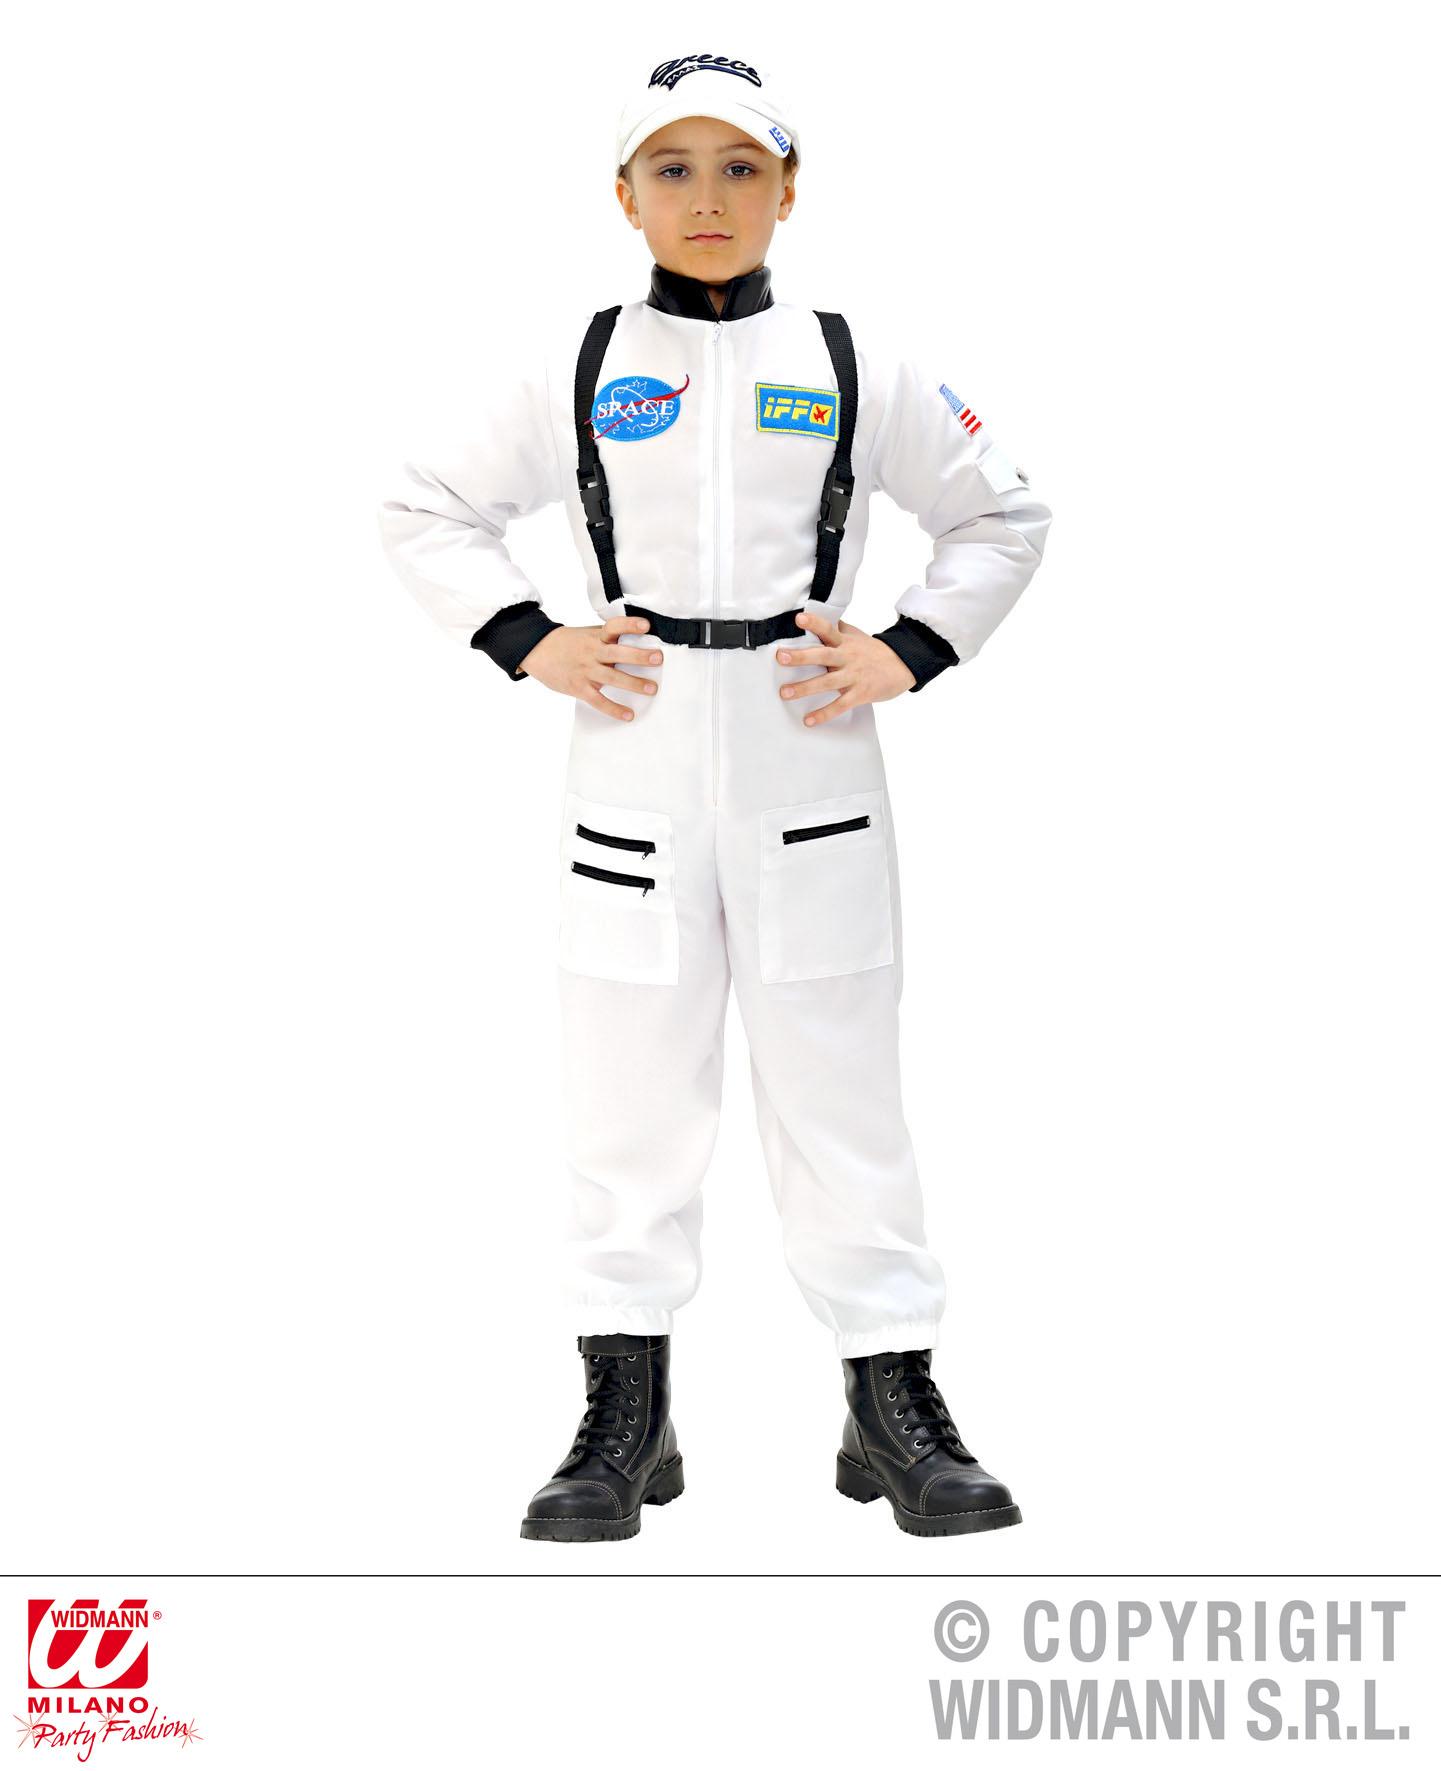 astronauten kost m astronaut gr e 140 kosmonaut raumfahrer sputnik anzug scherzwelt. Black Bedroom Furniture Sets. Home Design Ideas